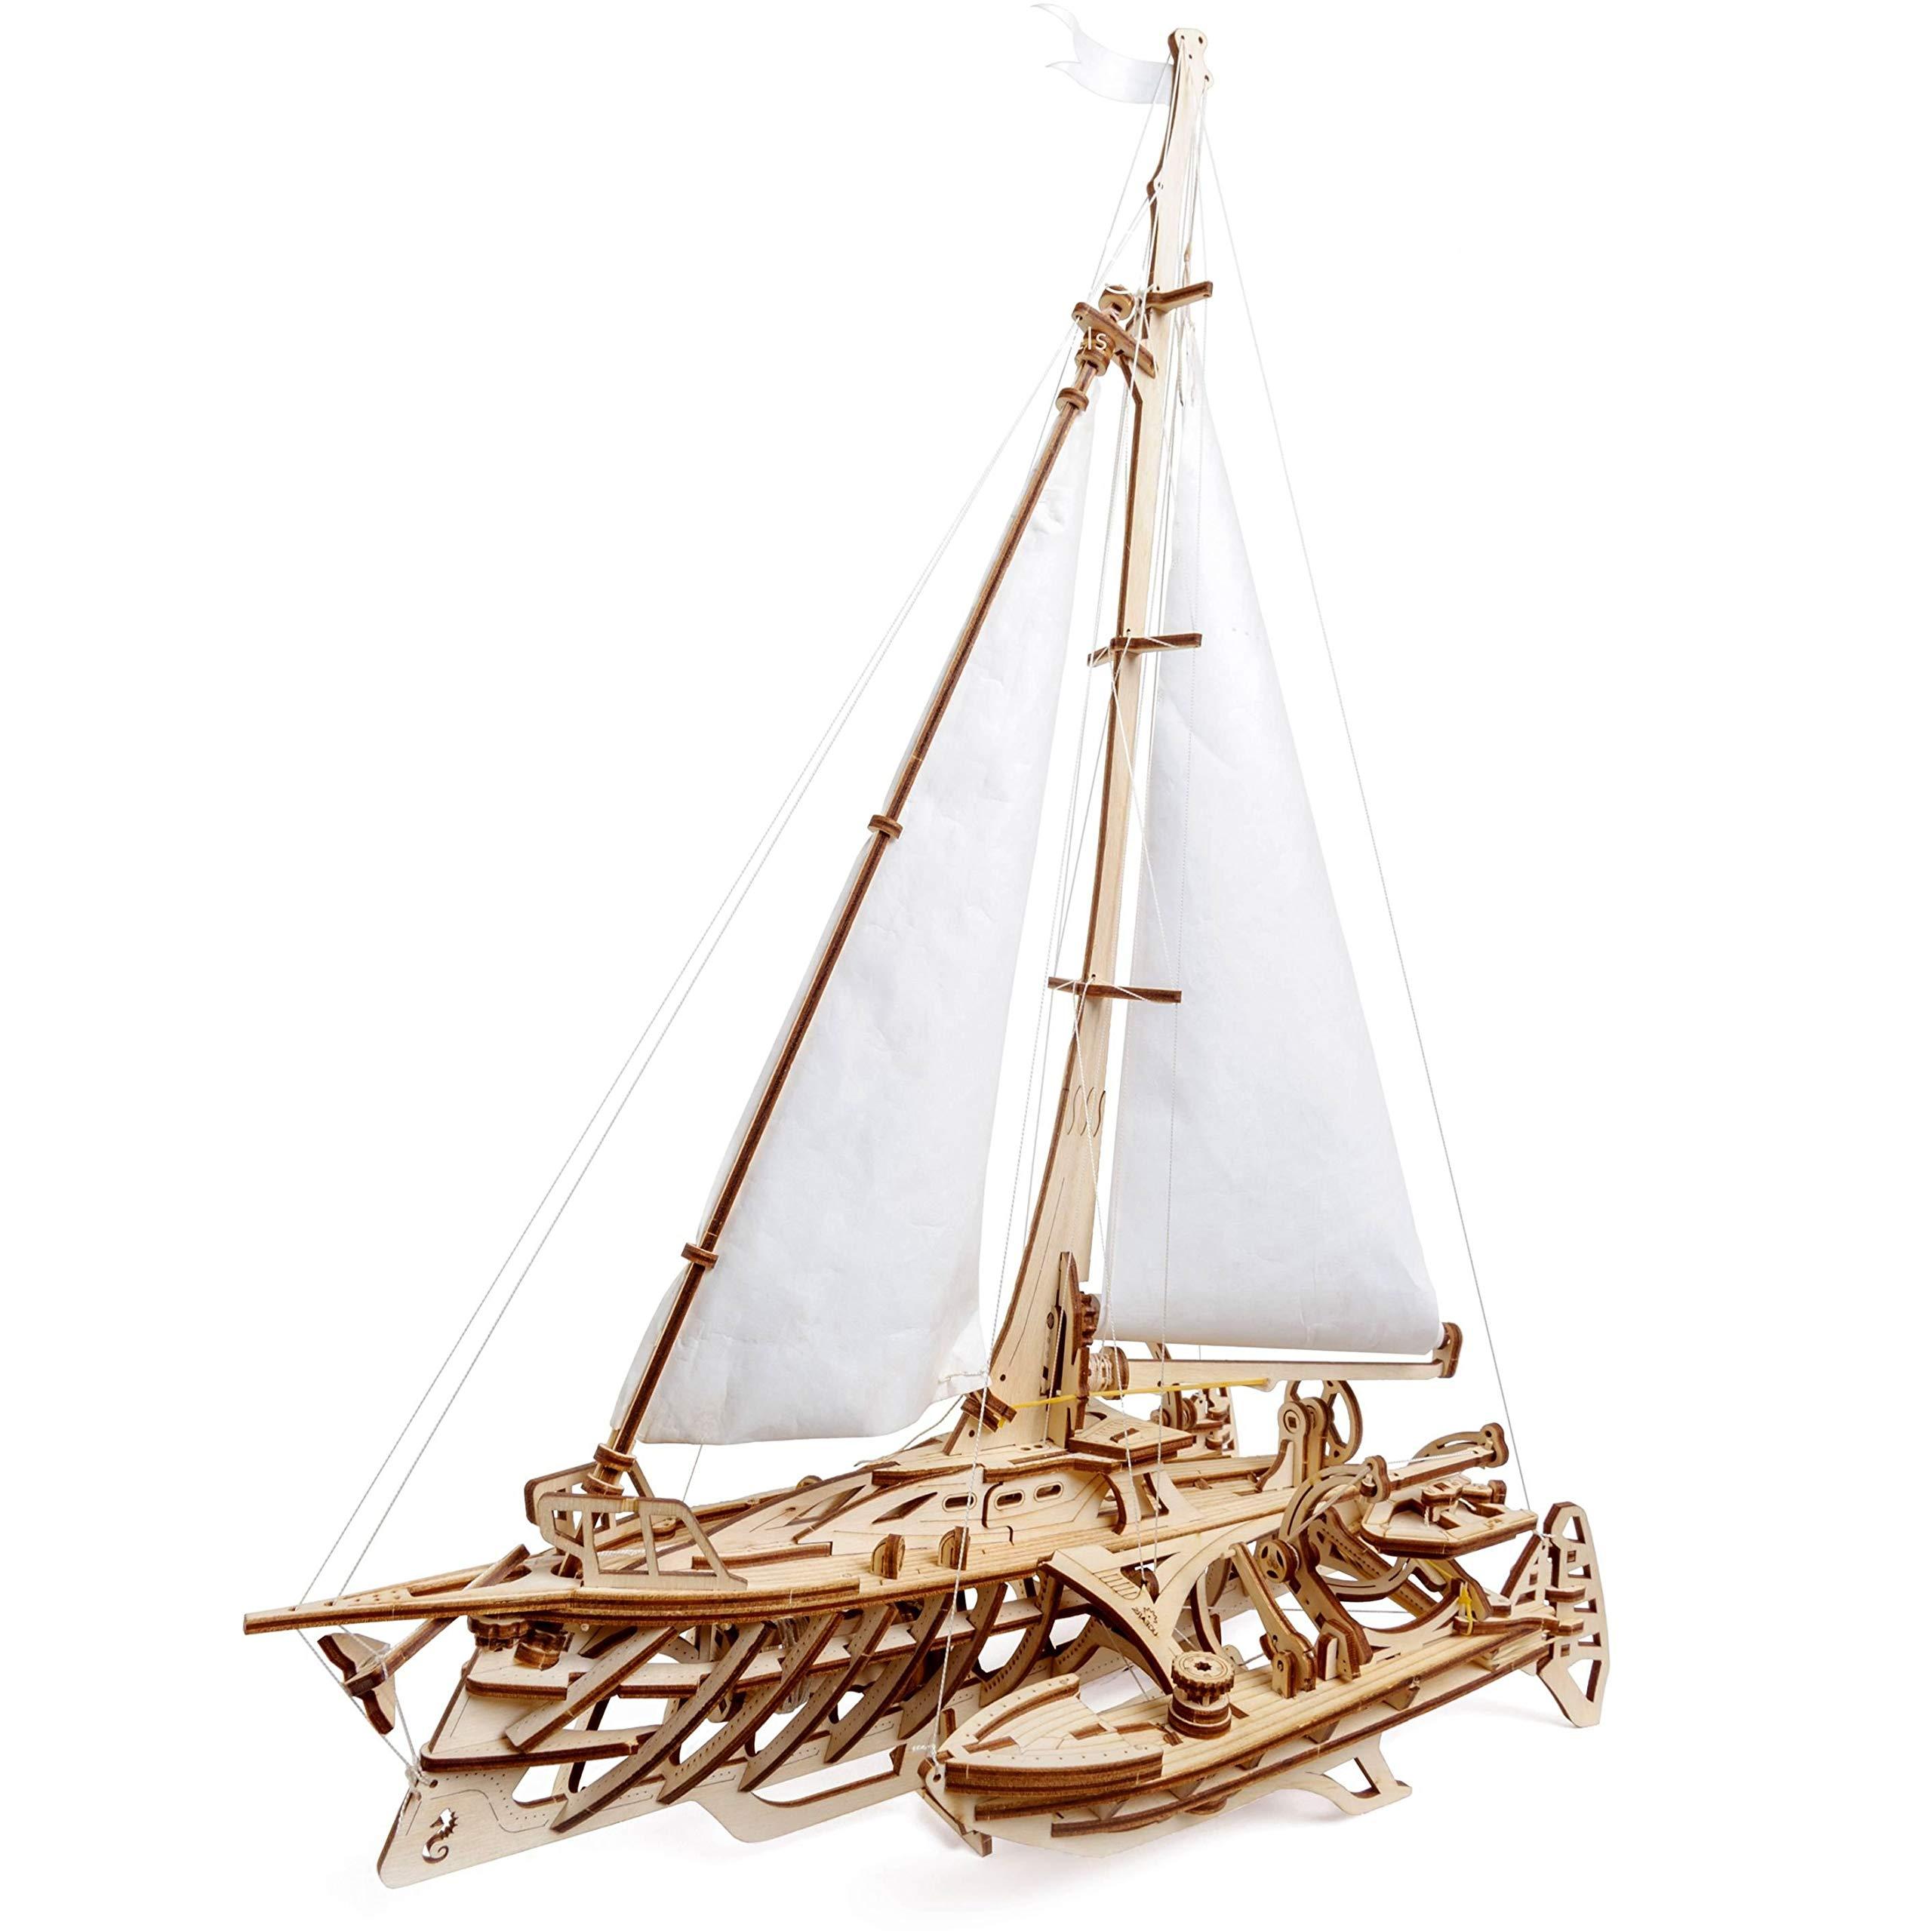 UGears Models 3-D Wooden Puzzle - Mechanical Trimaran Merihobus Sailboat by UGEARS